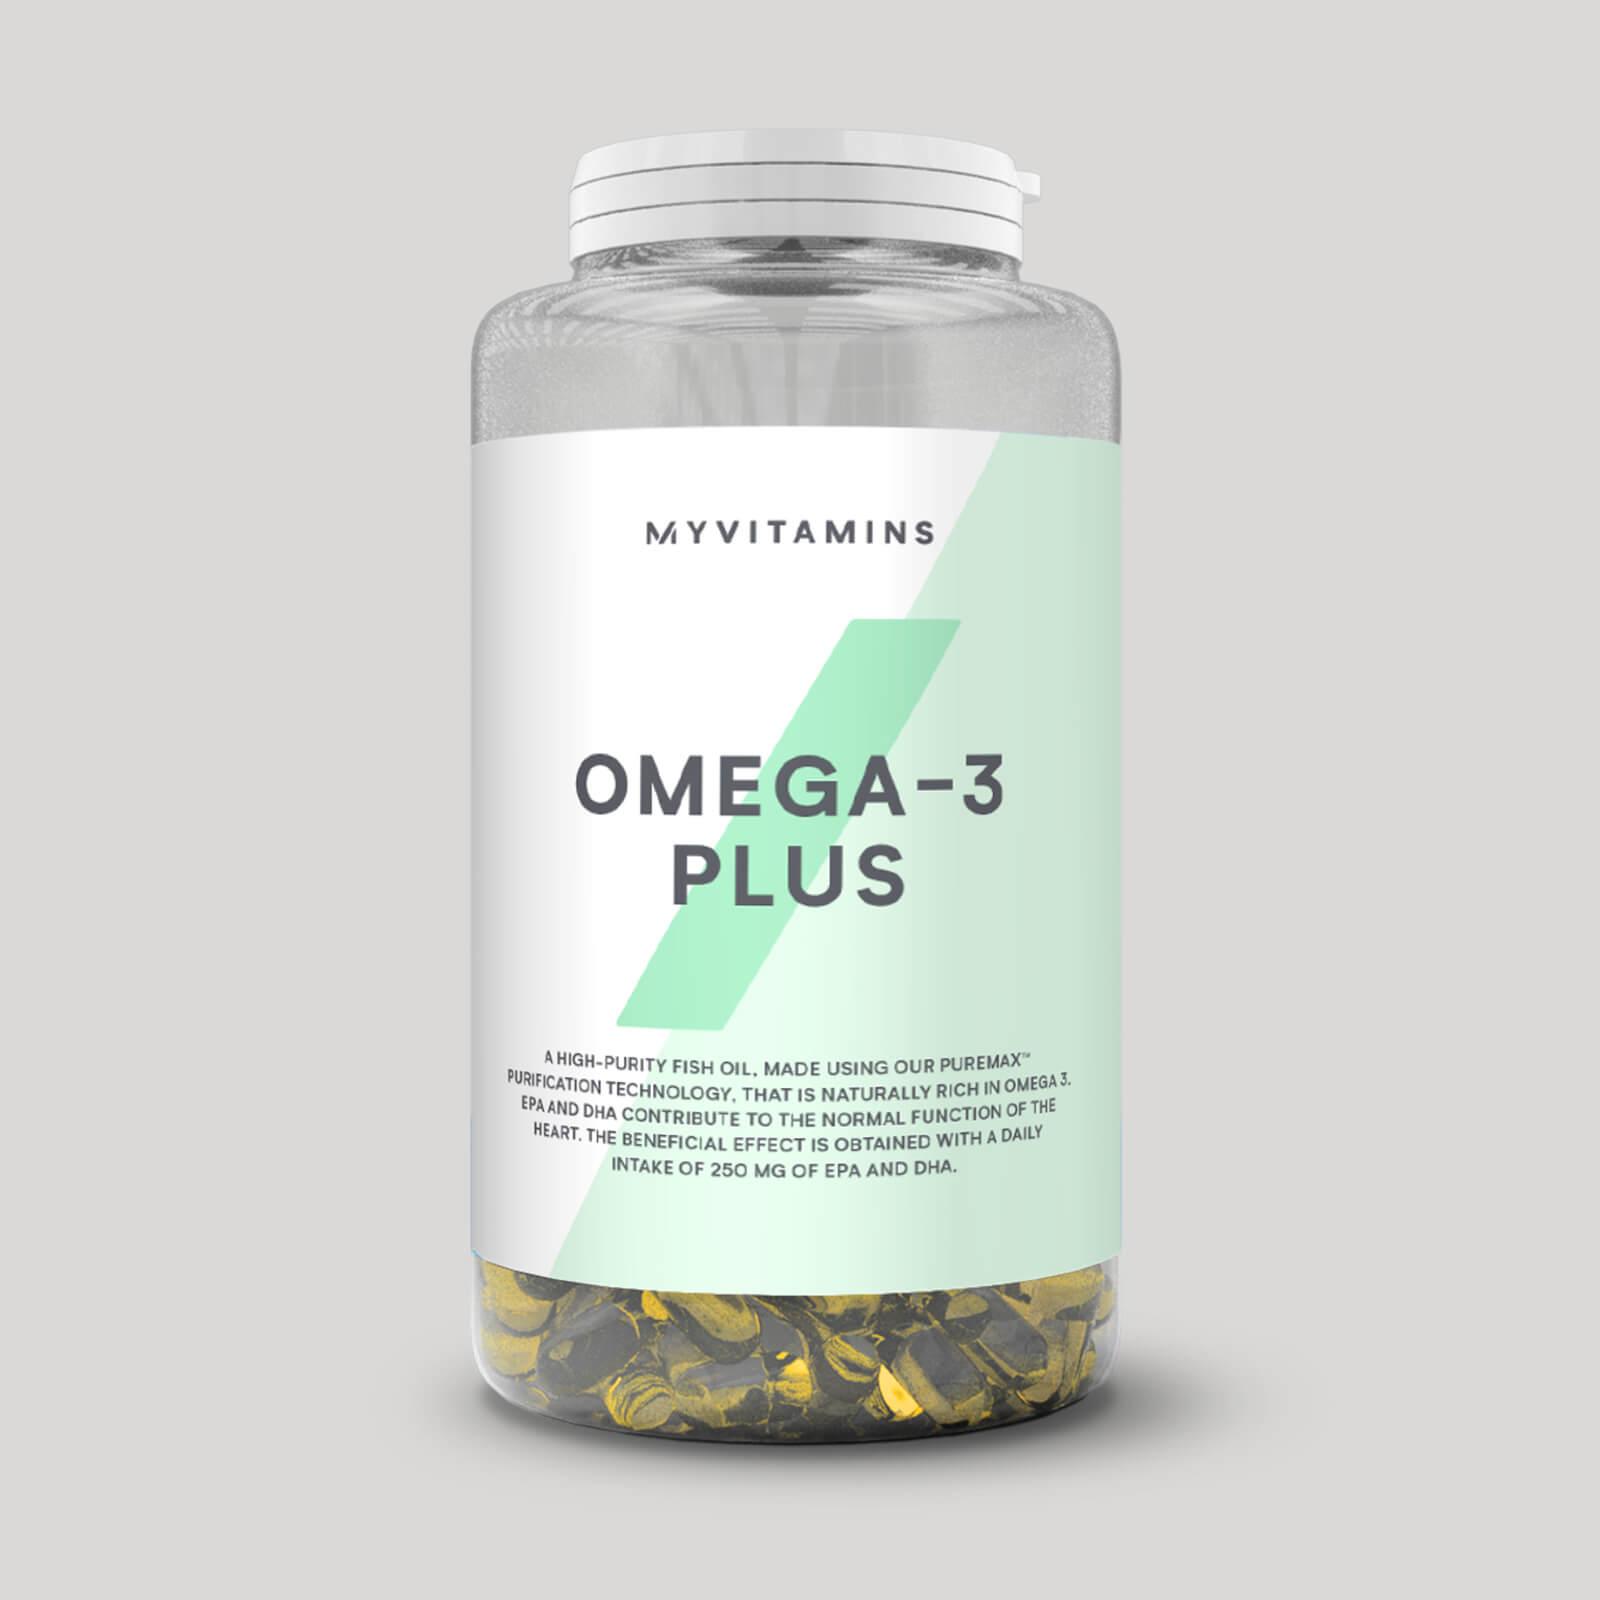 Omega 3 MyProtein